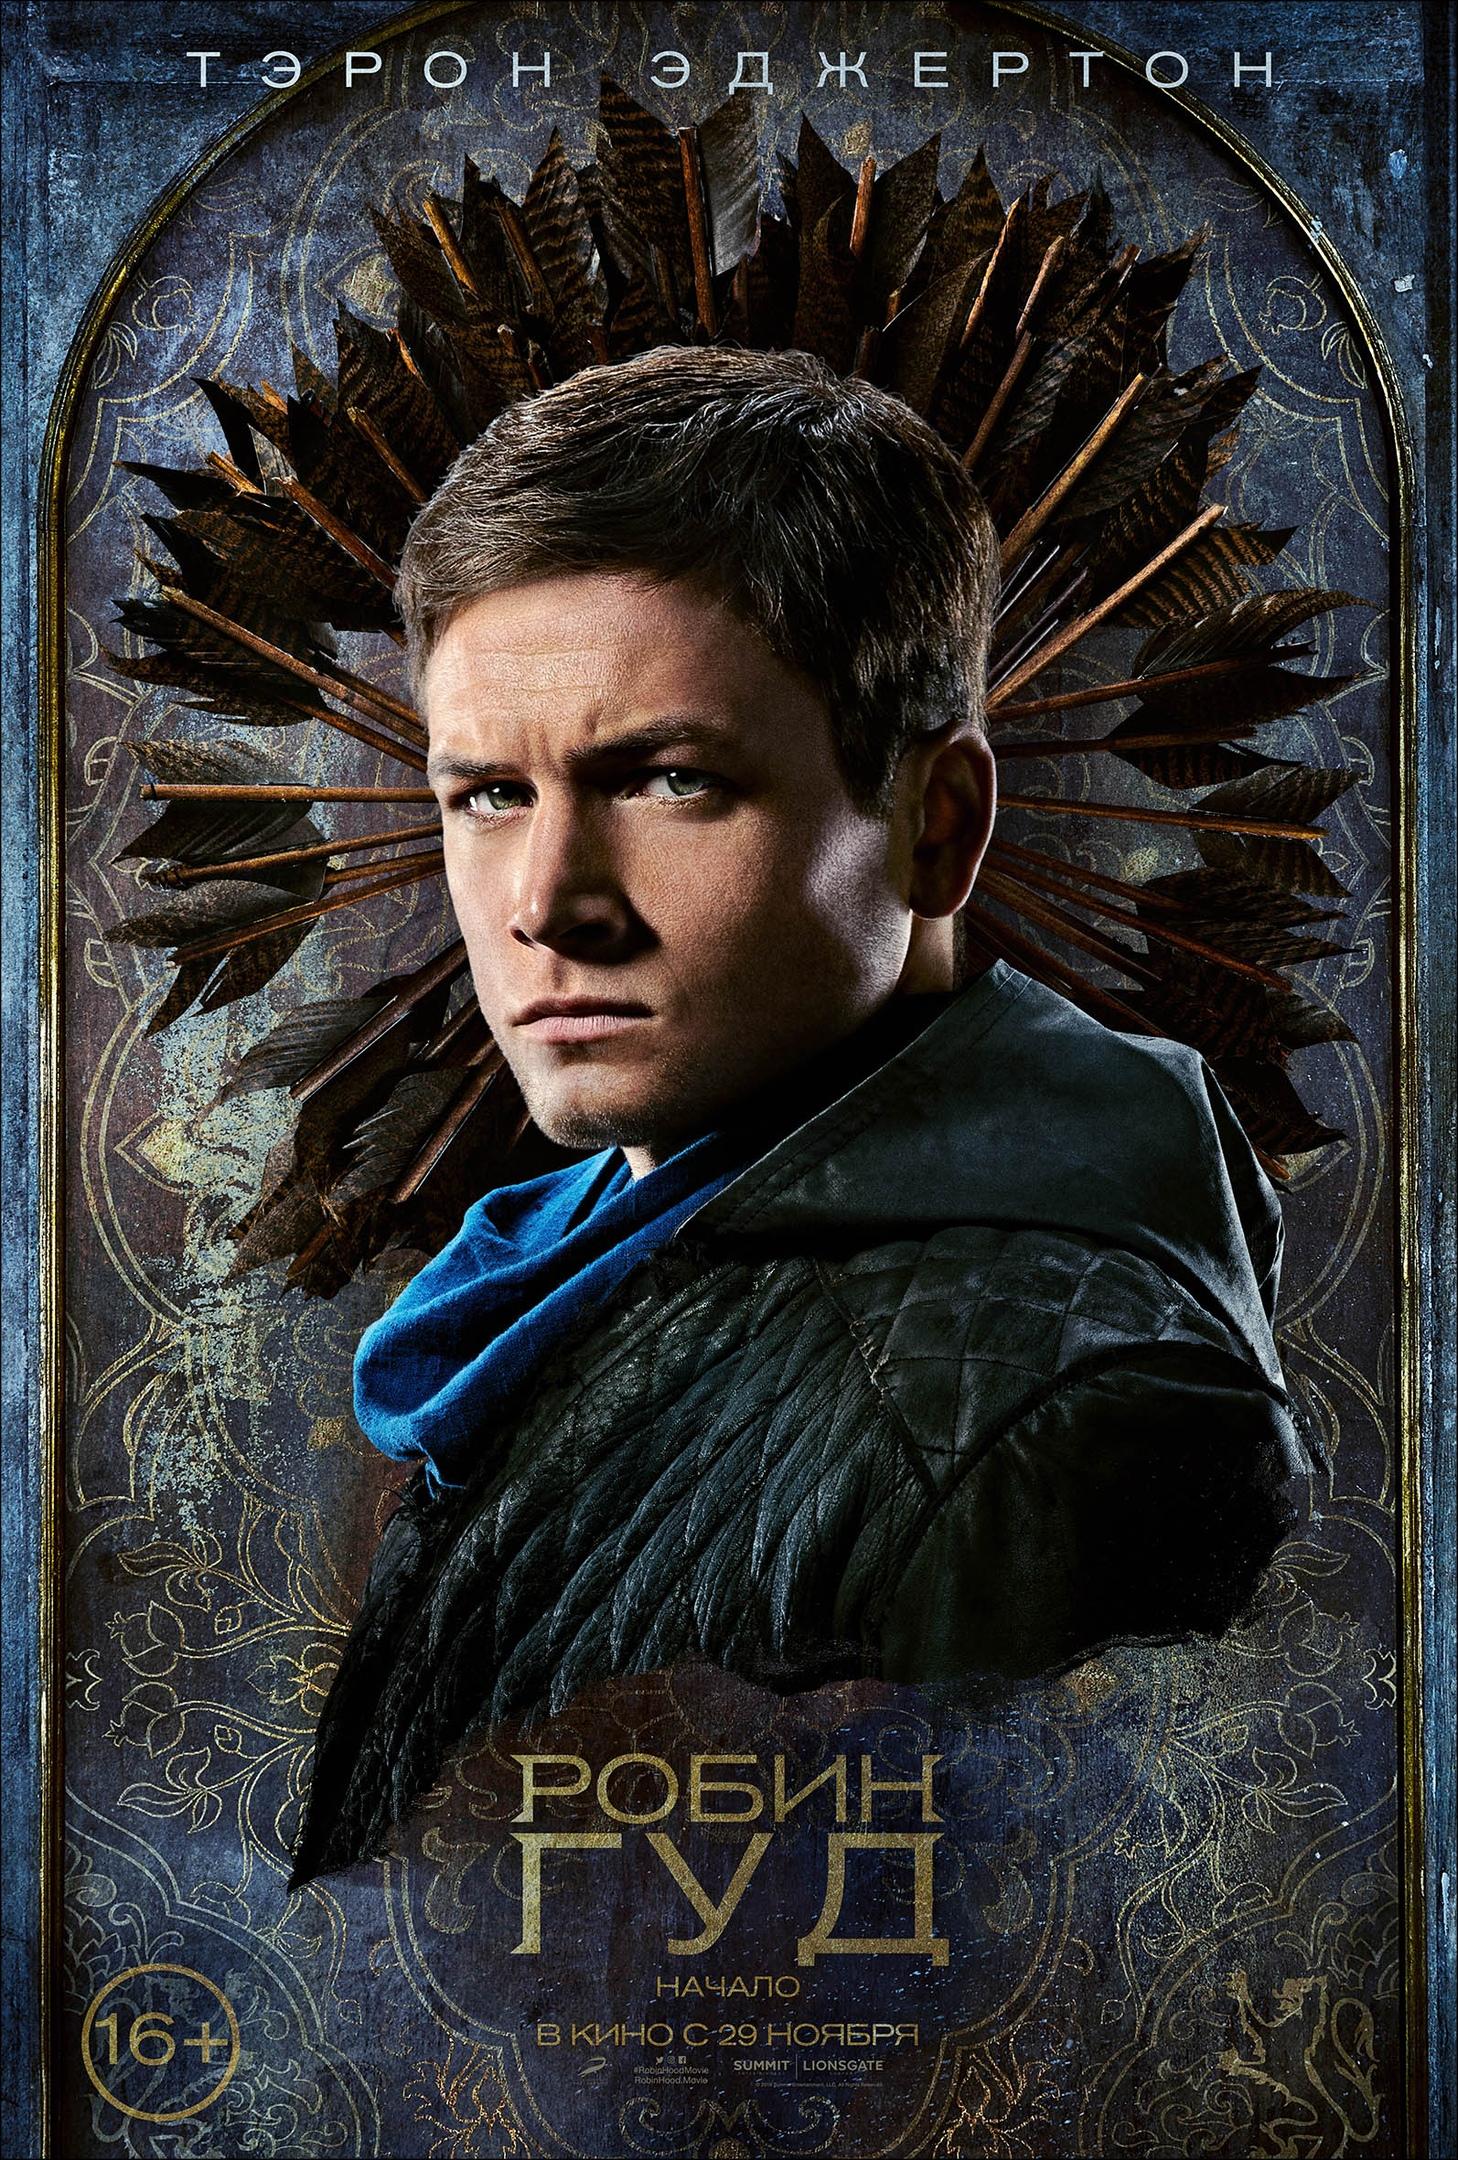 Робин Гуд: Начало, постер № 16